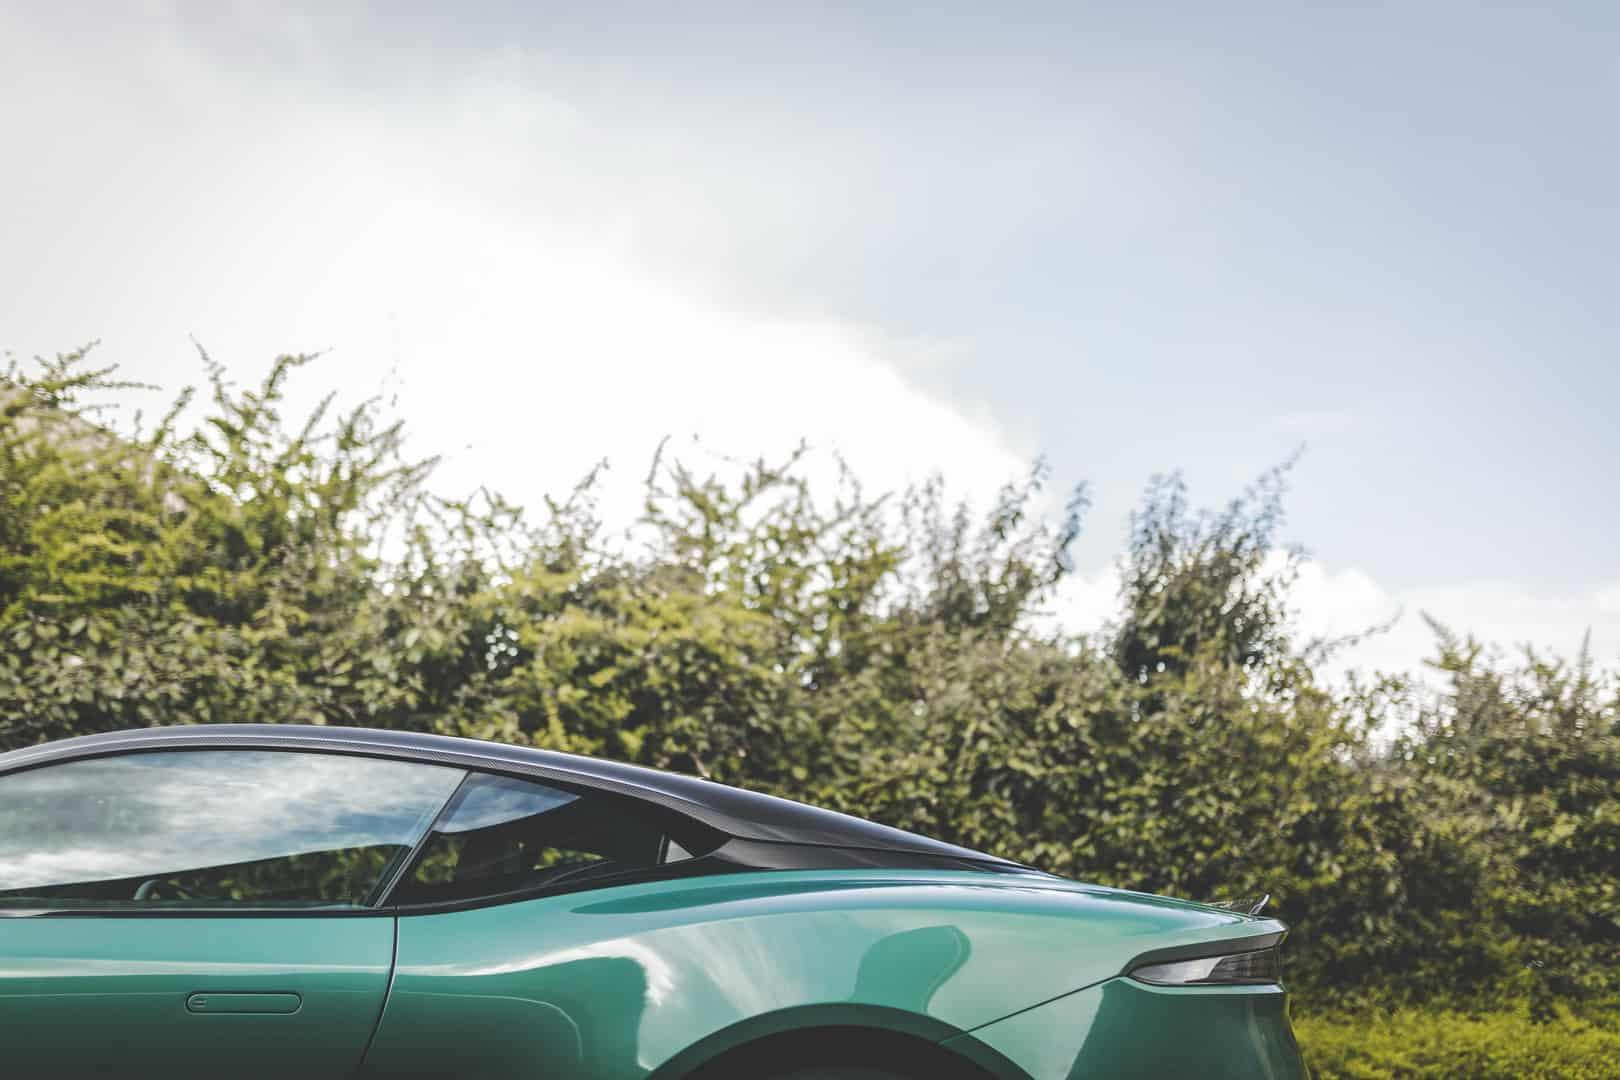 Aston Martin DBS 59 5